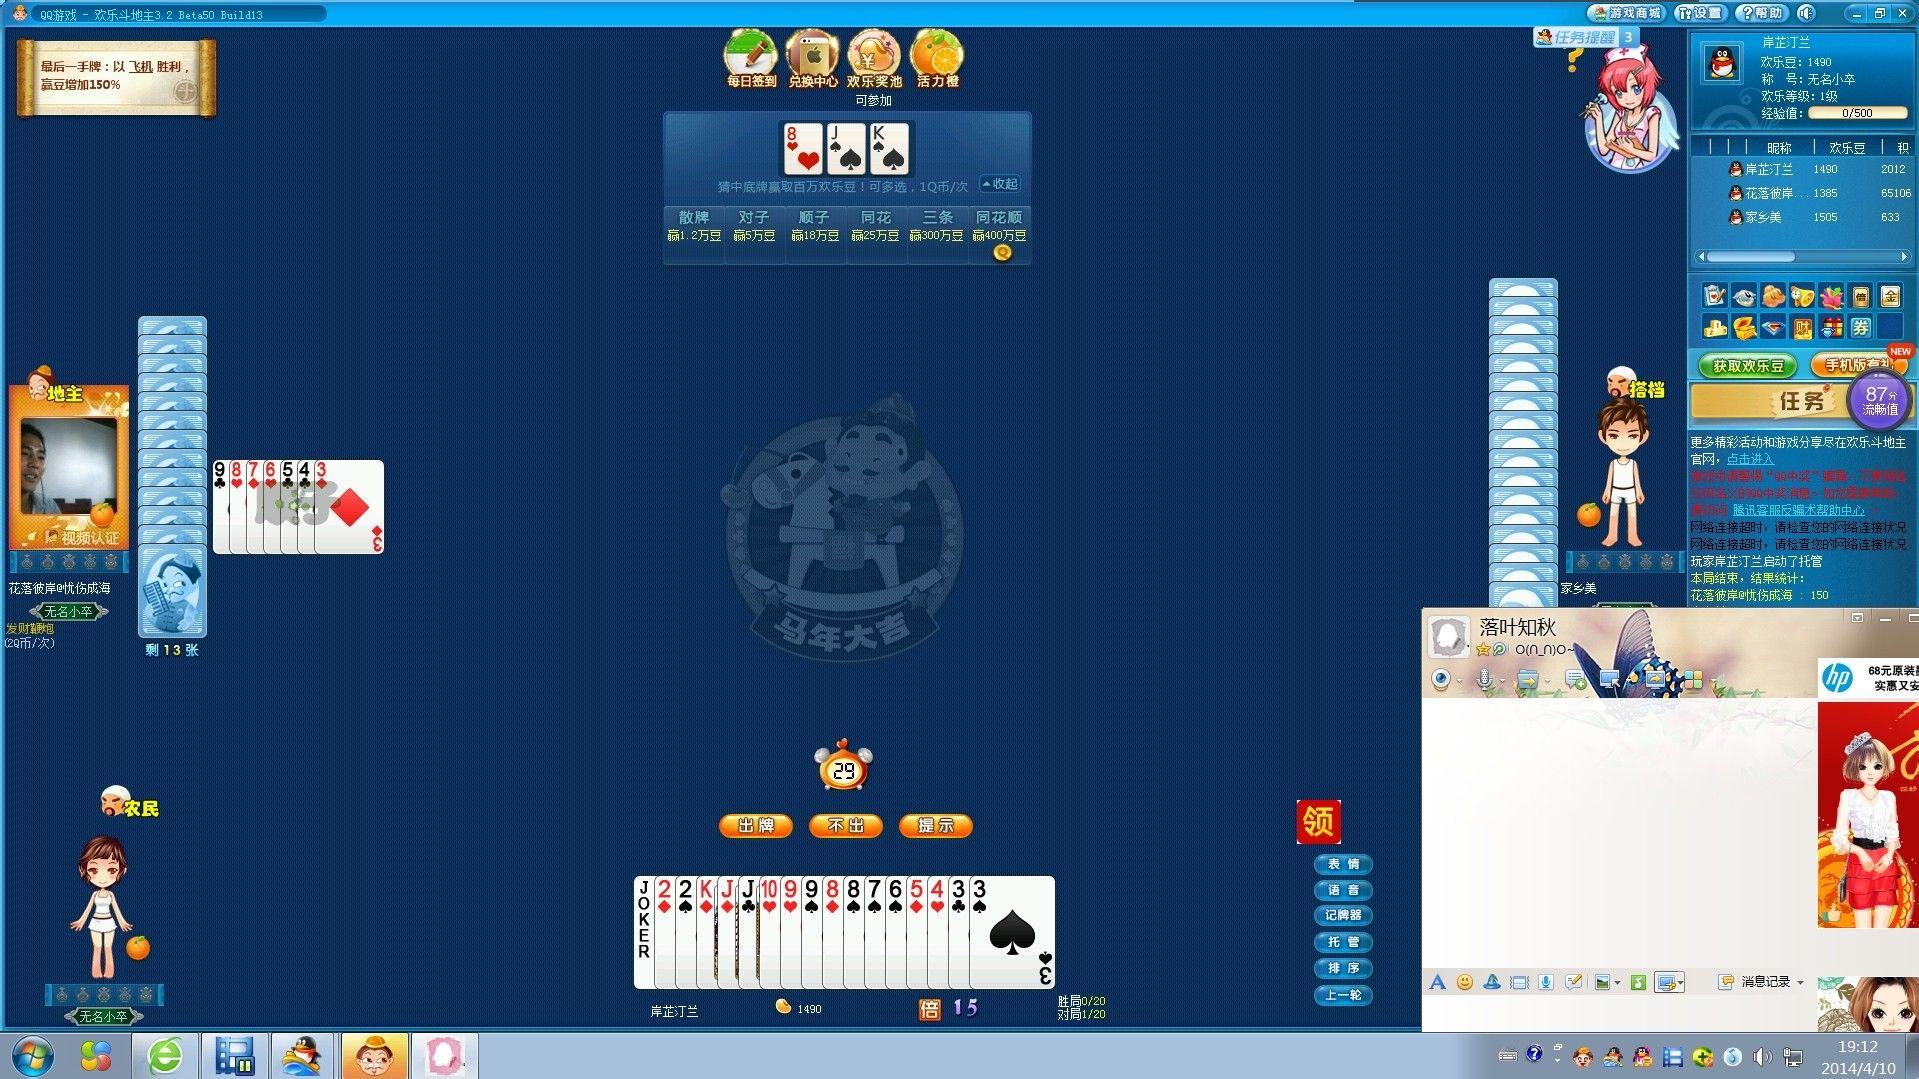 win7桌面显示小图标_新装的win7系统 打开任何软件界面都特小,设置了分辨率也只是 ...